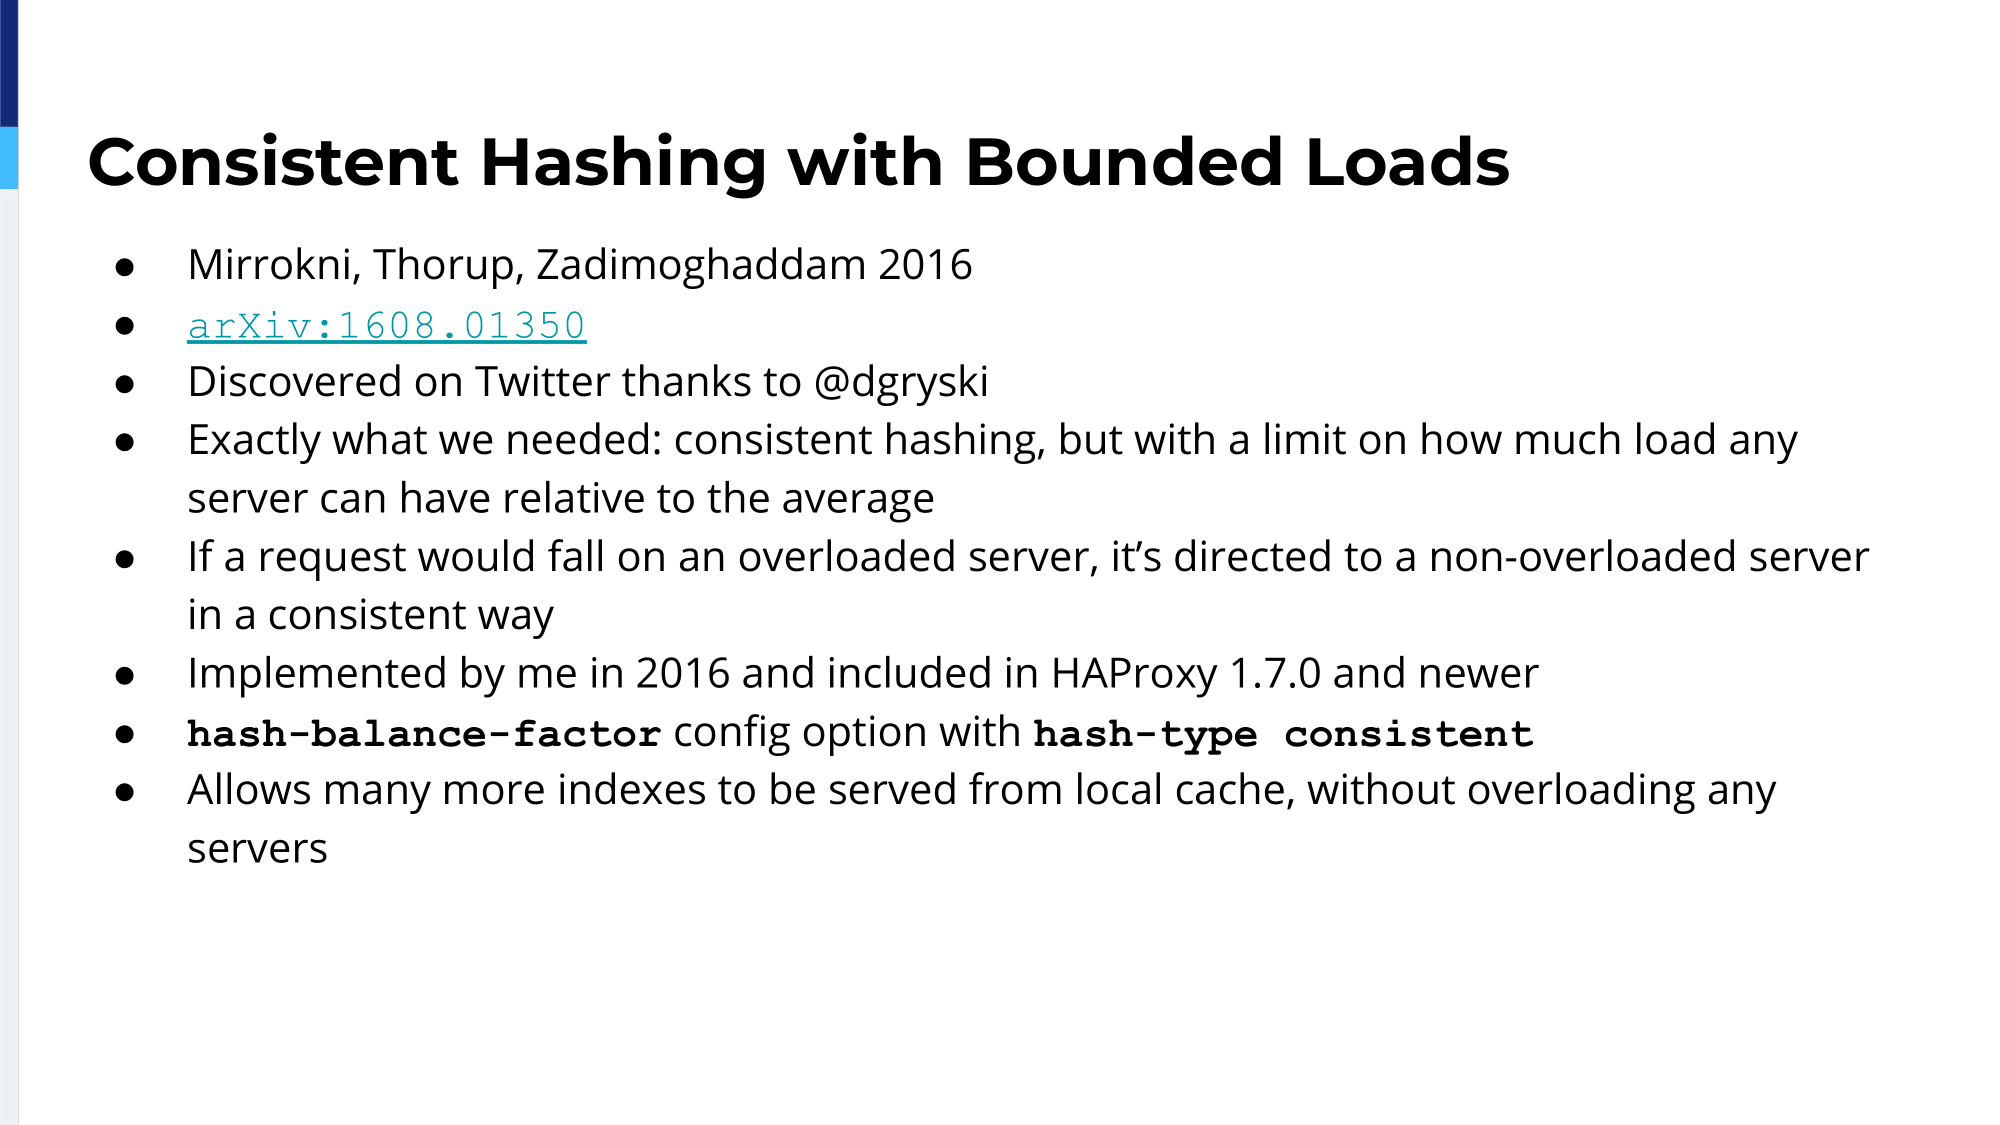 haproxyconf2019_haproxy load balancing at vimeo_andrew rodland_7